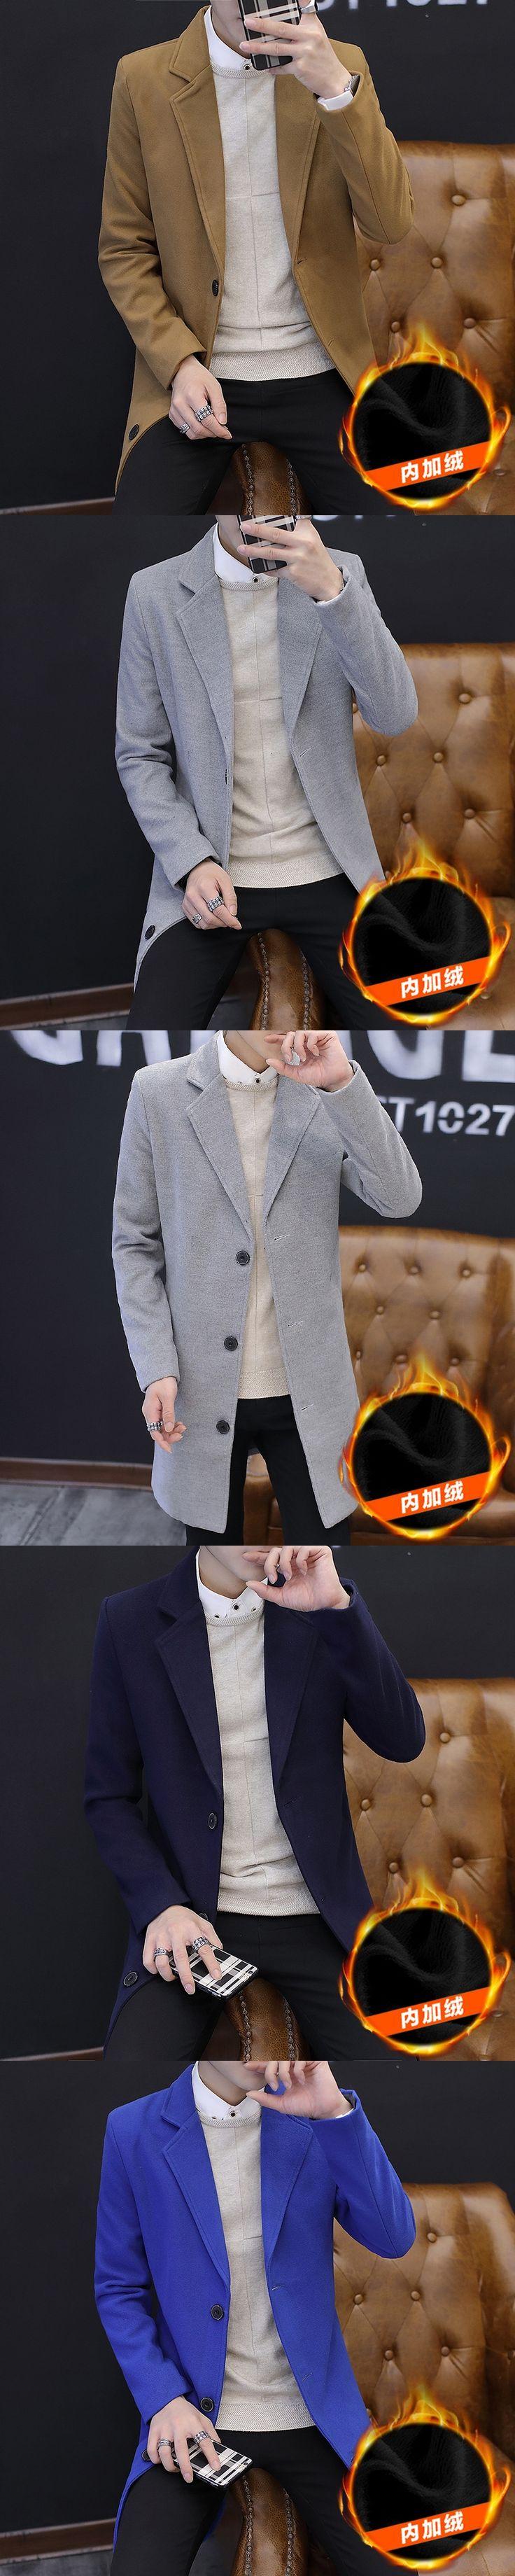 Man Long Black Coat Gentlemen Men Winter Coats Male Cardigan Elongated For European Jackets Raincoat Nylon Mens Trench Knit f20+